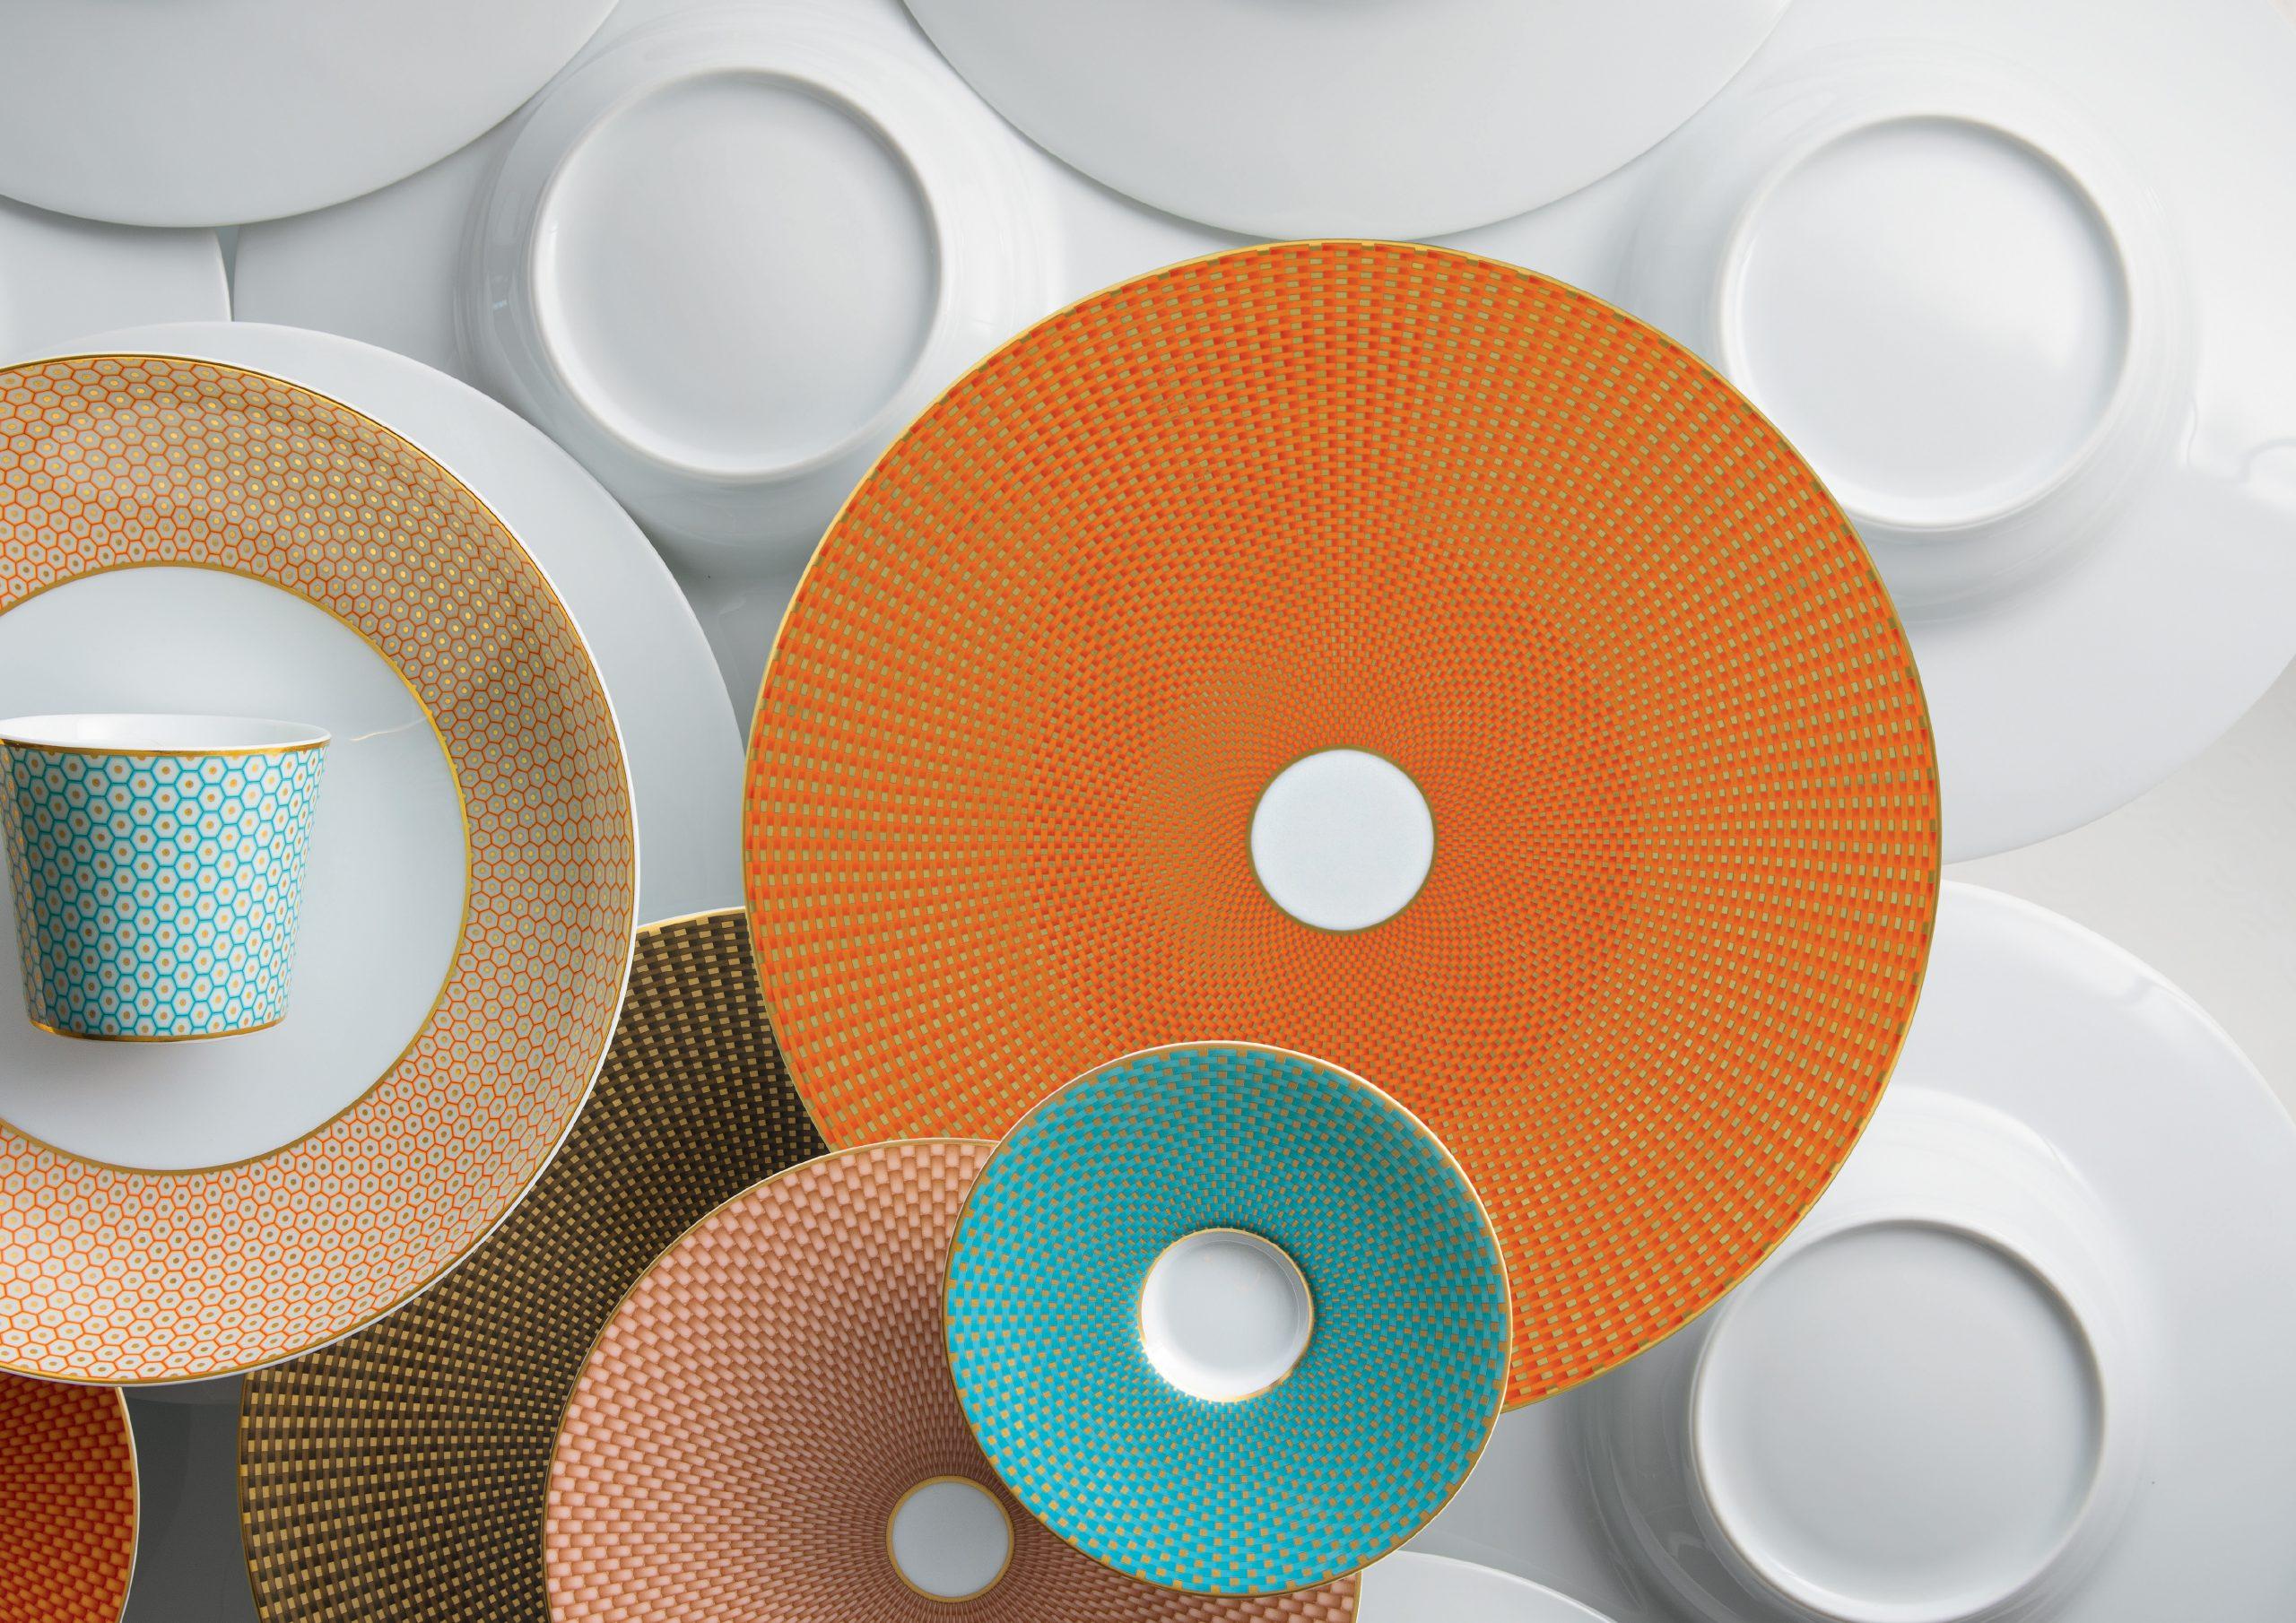 amb_table_couleurs – 1 – General_catalog_Tresor_Mix&match3 – Raynaud